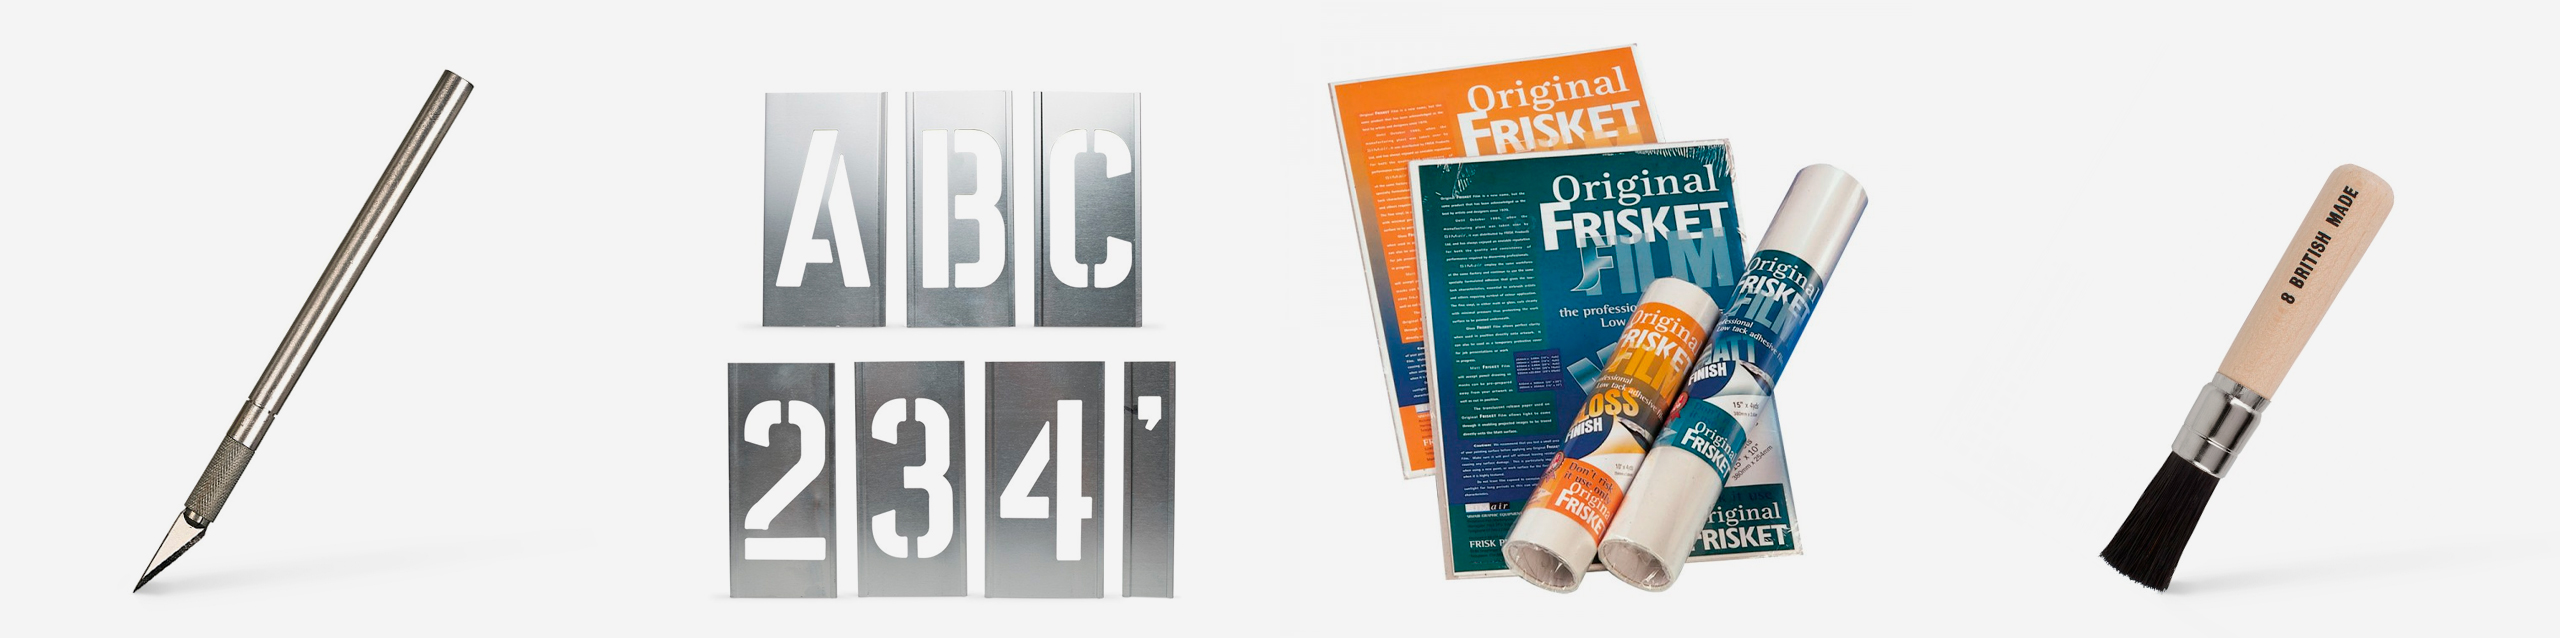 L-R: Jakar Hobby Knife, Handover Lettering Metal Stencils, Frisket Film, Handover Black Bristle Stencil Brush